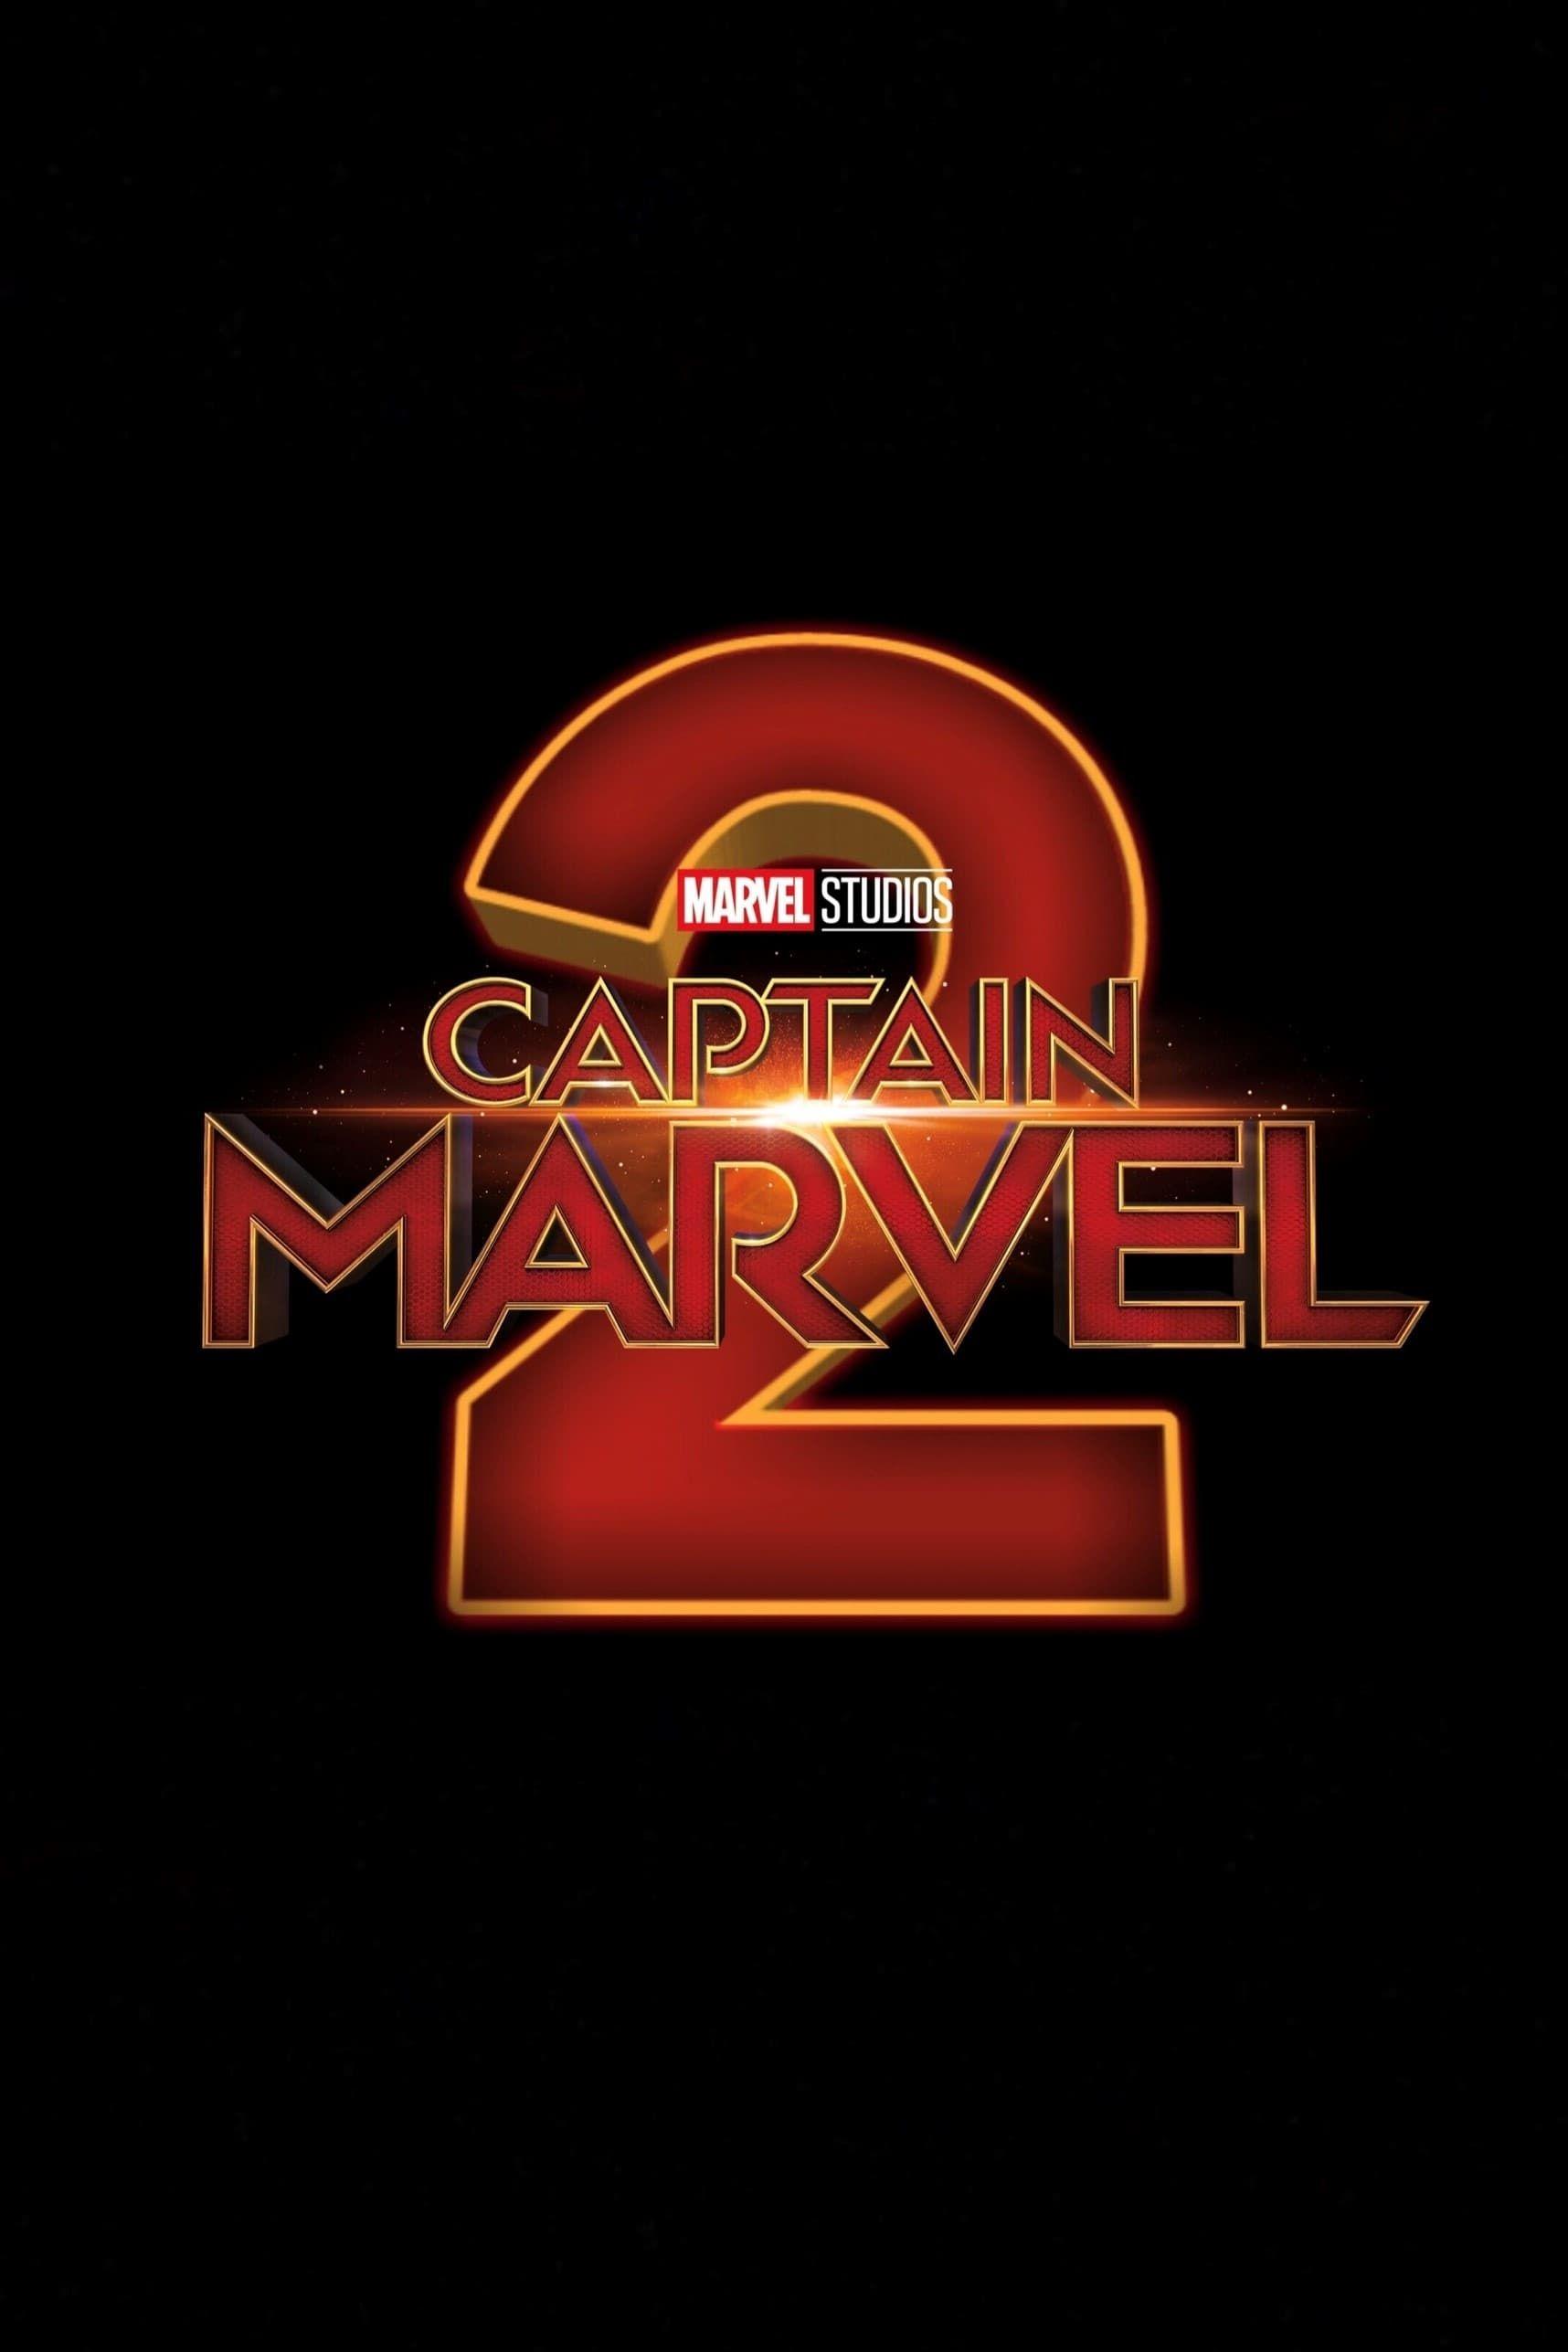 Watch Untitled Spider Man 3 2021 Download Movie Dvdrip Movies Hd Best Marvel Movies Captain Marvel Marvel Movies